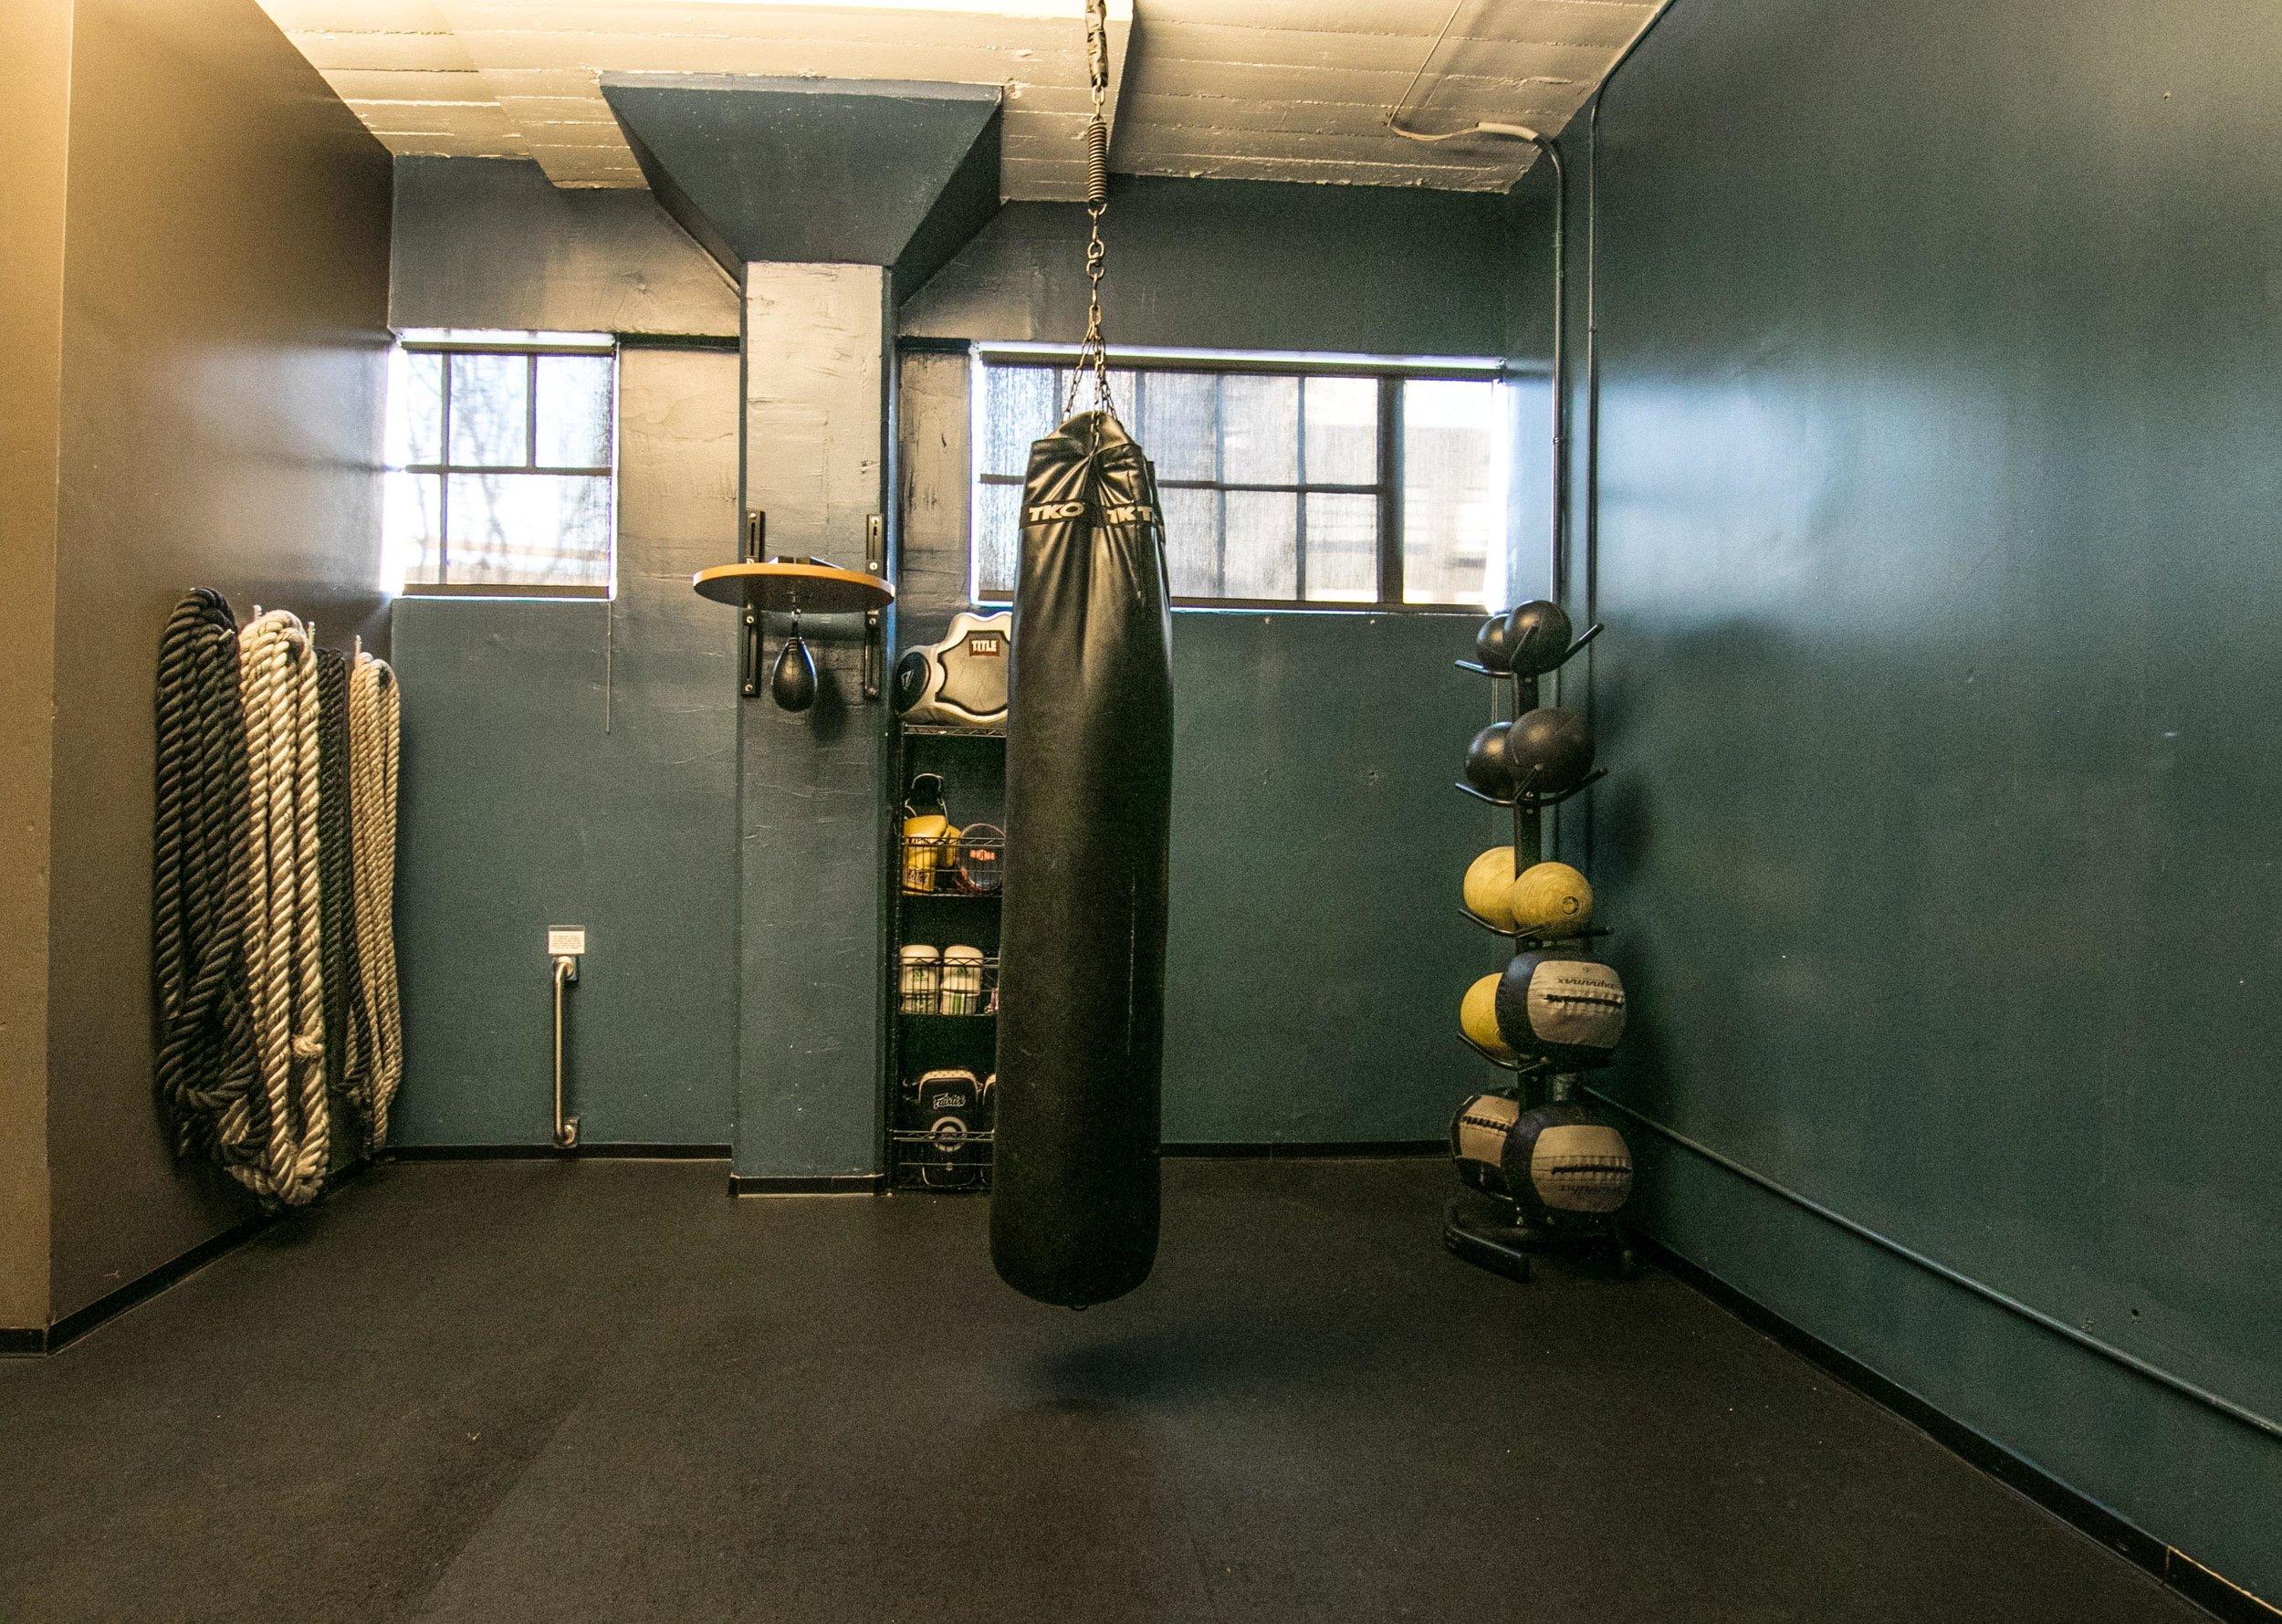 Boxing San Francisco DIAKADI med balls ropes.jpg